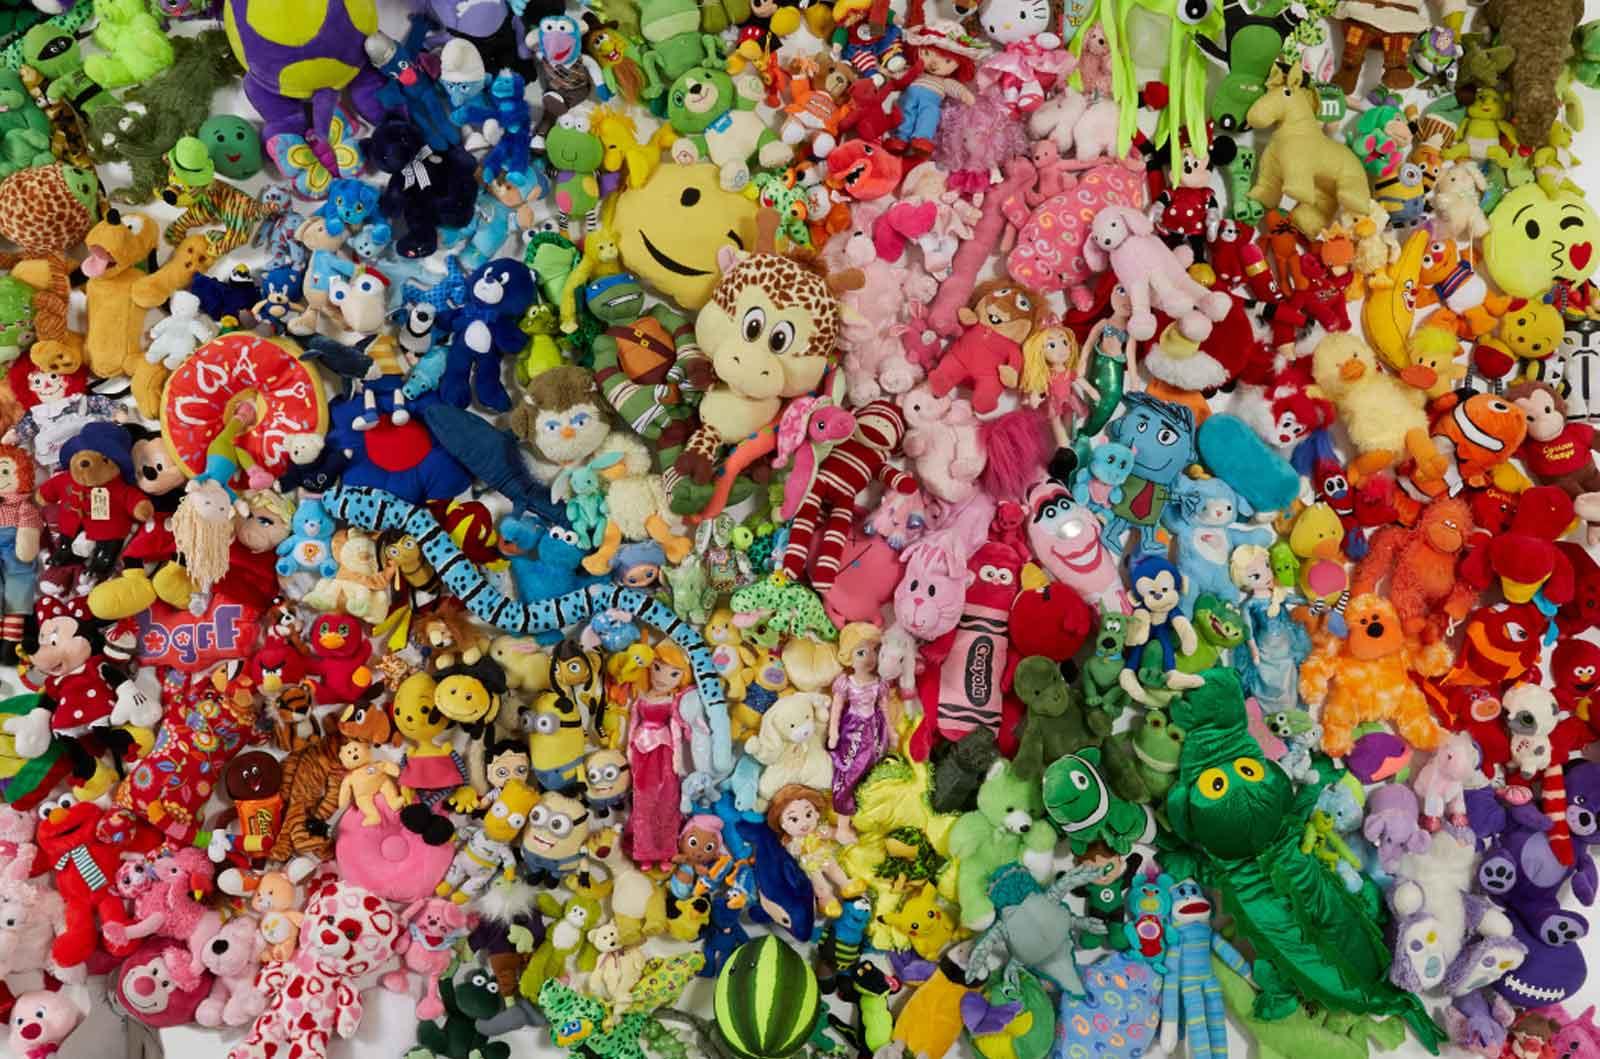 Many colorful stuffed animals